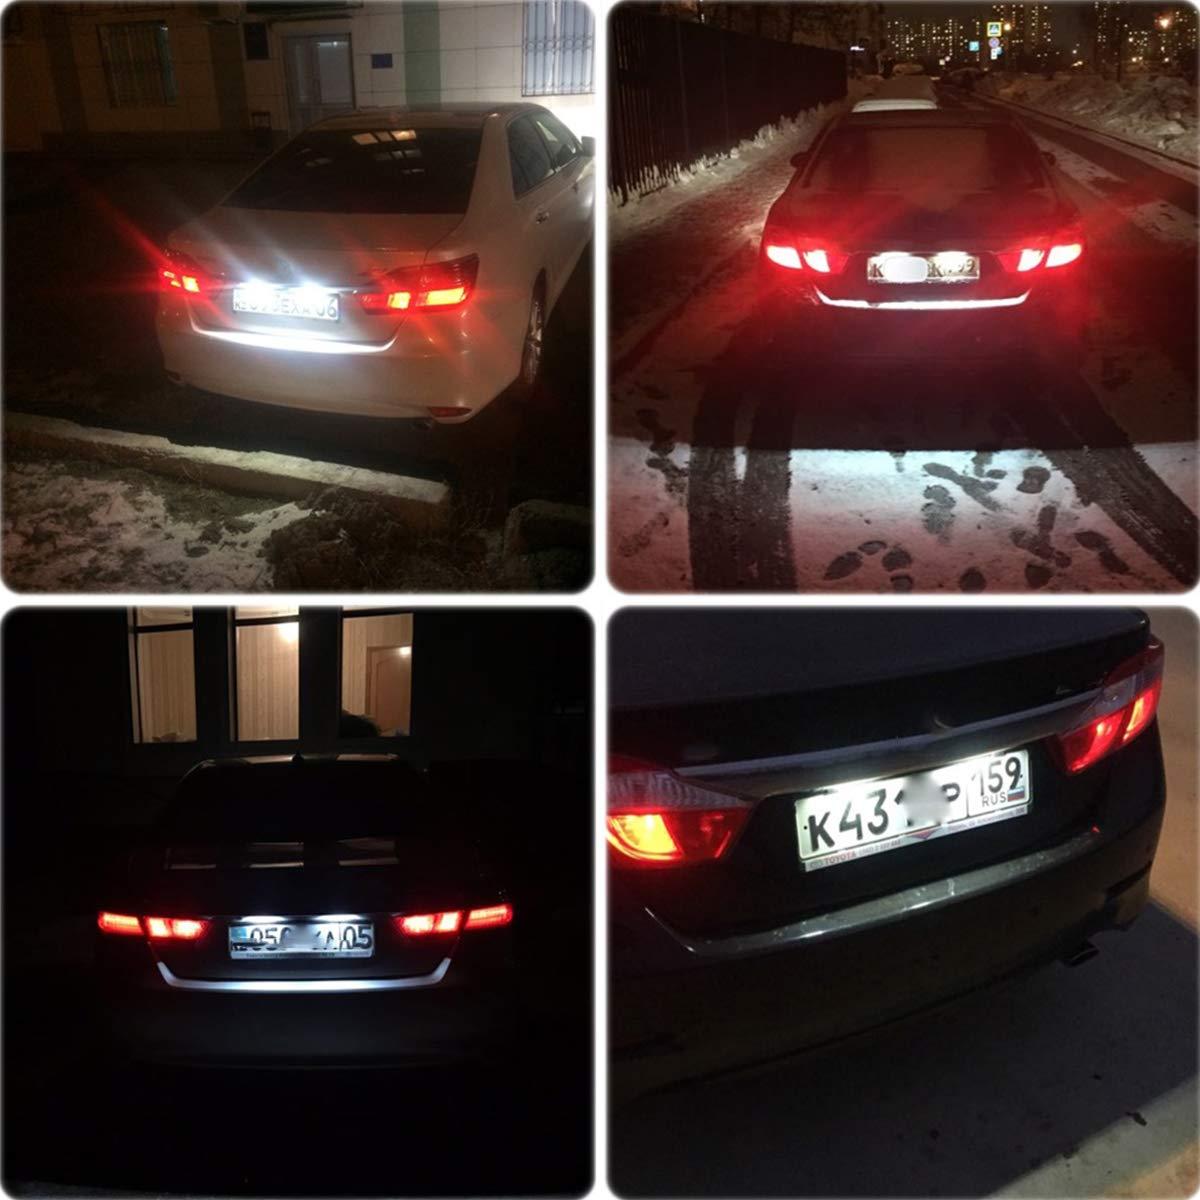 GOFORJUMP bianco auto LED numero targa luce kit per l//Exus LX470/GX470/T//Oyota Land Cruiser 120/Prado Land Cruiser 200